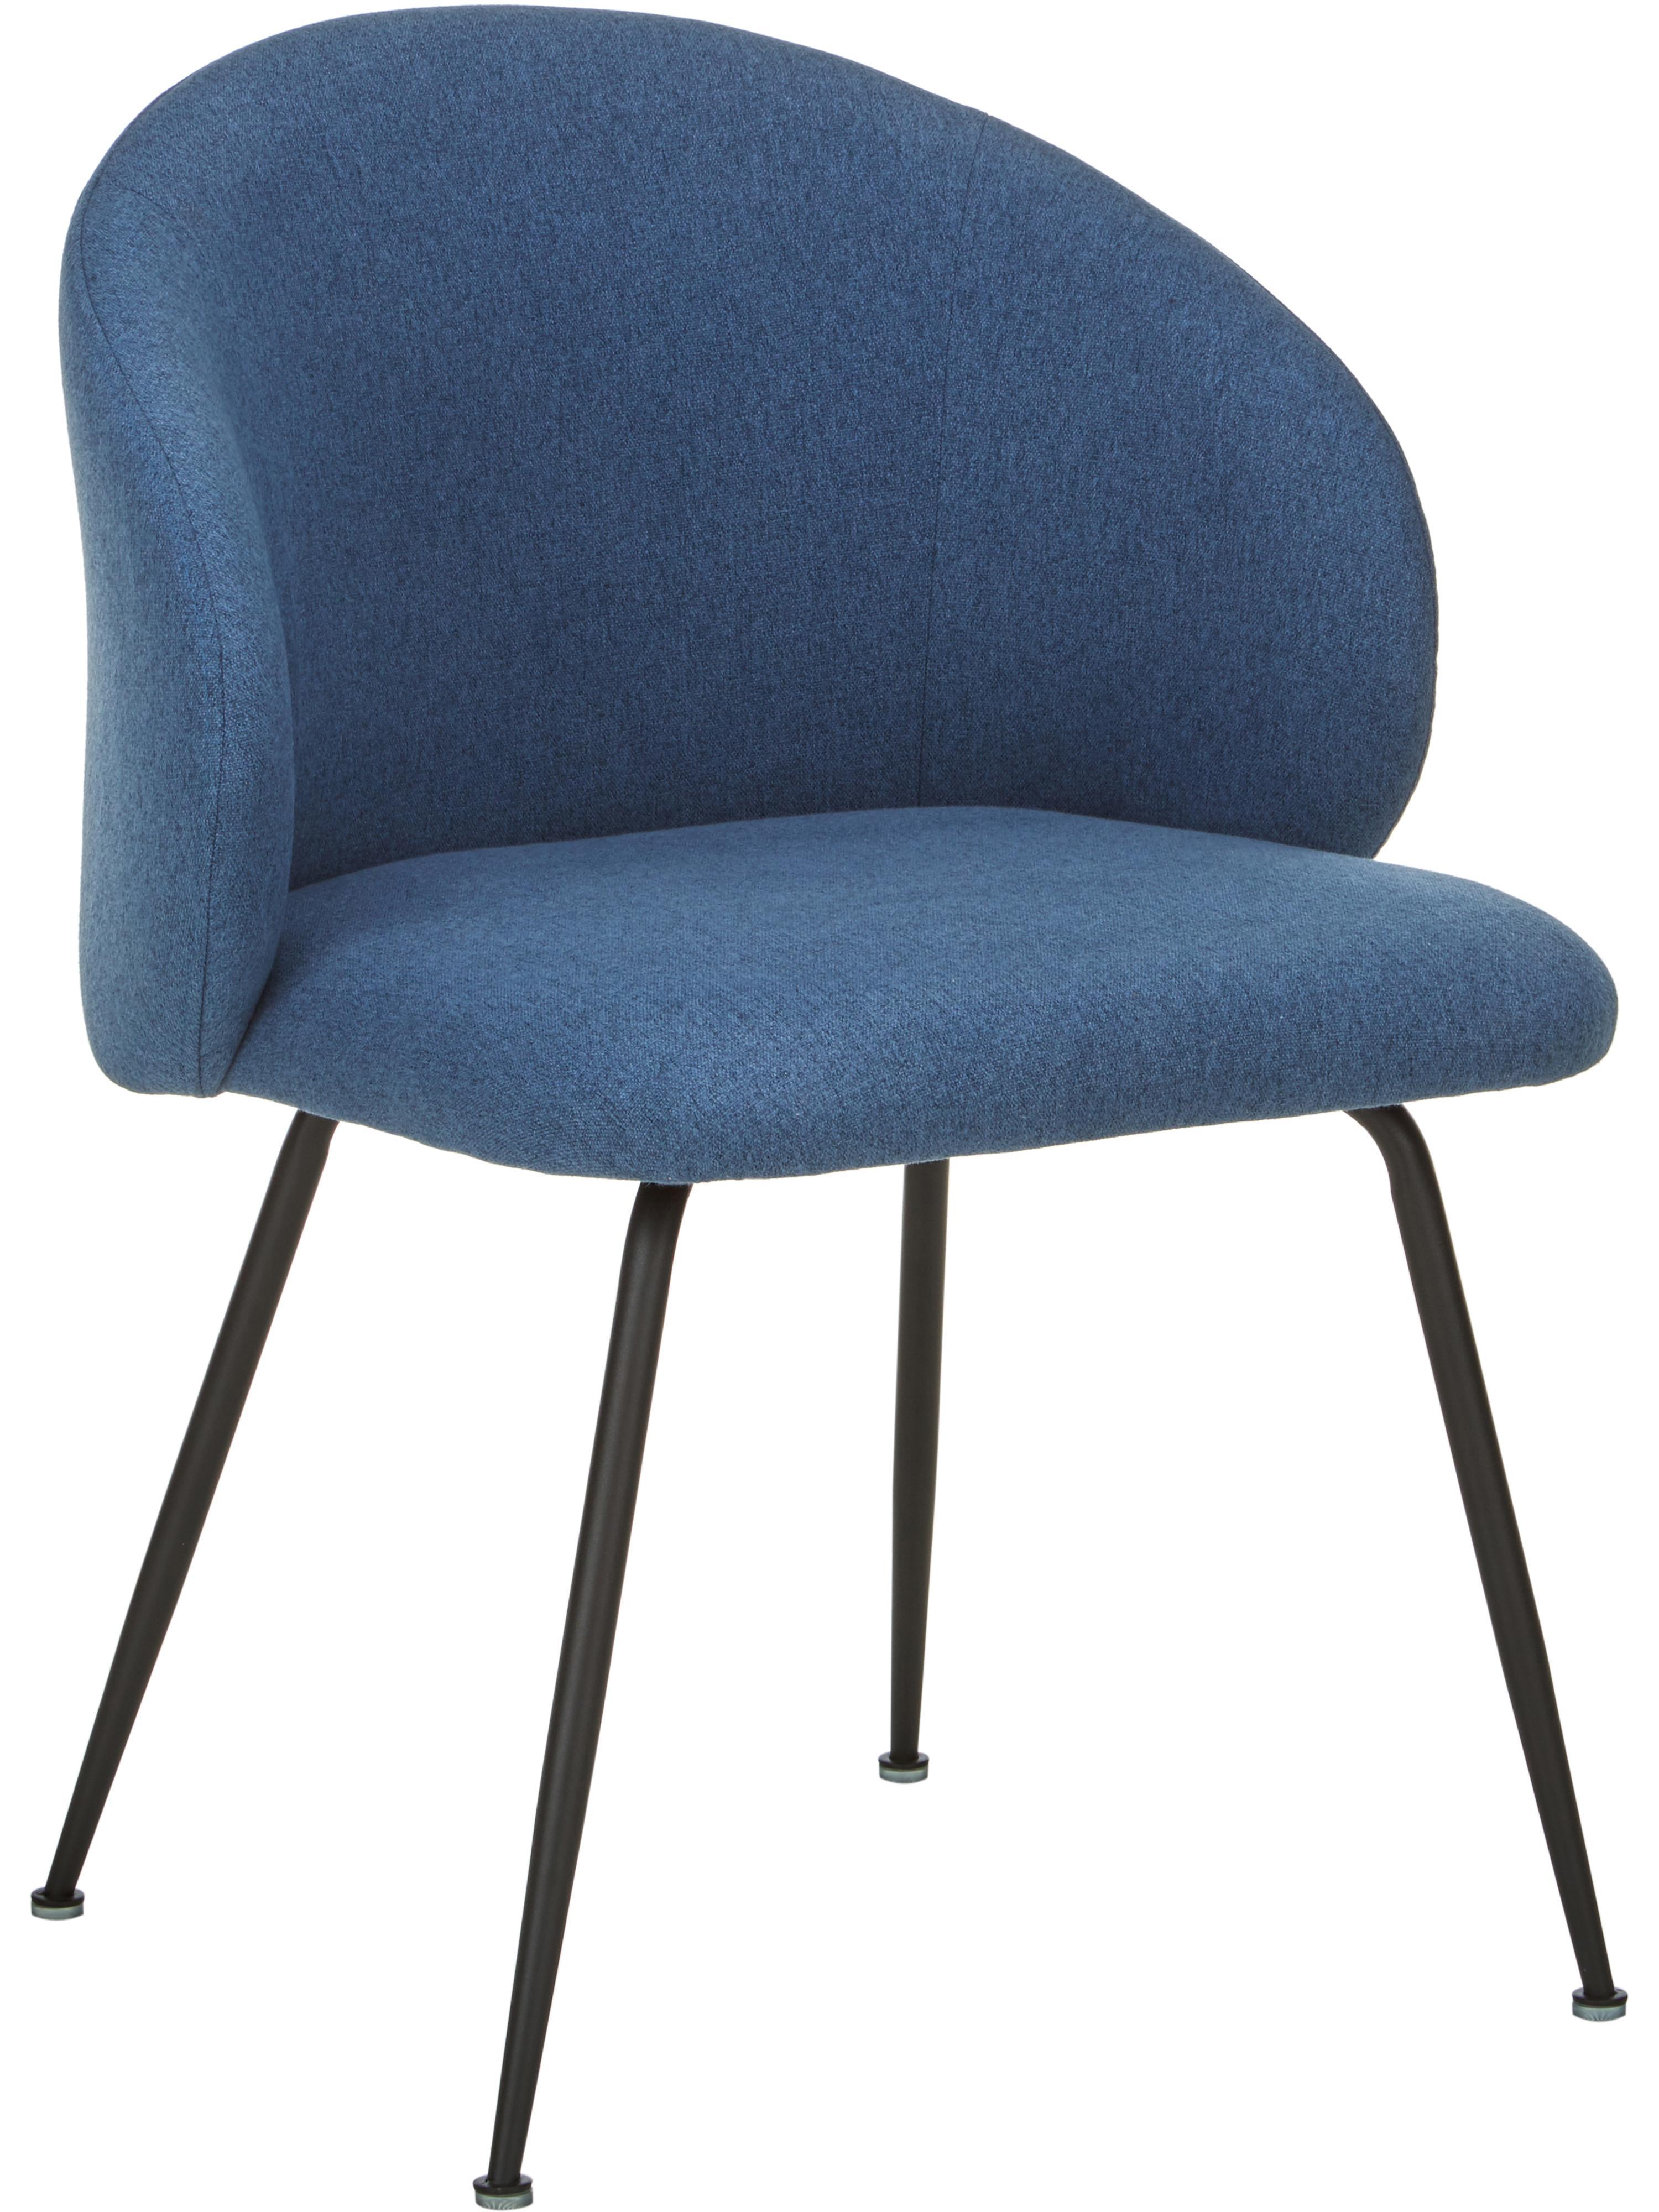 Sedia imbottita Luisa 2 pz, Rivestimento: 100% poliestere, Gambe: metallo verniciato a polv, Tessuto blu, nero, Larg. 61 x Prof. 58 cm